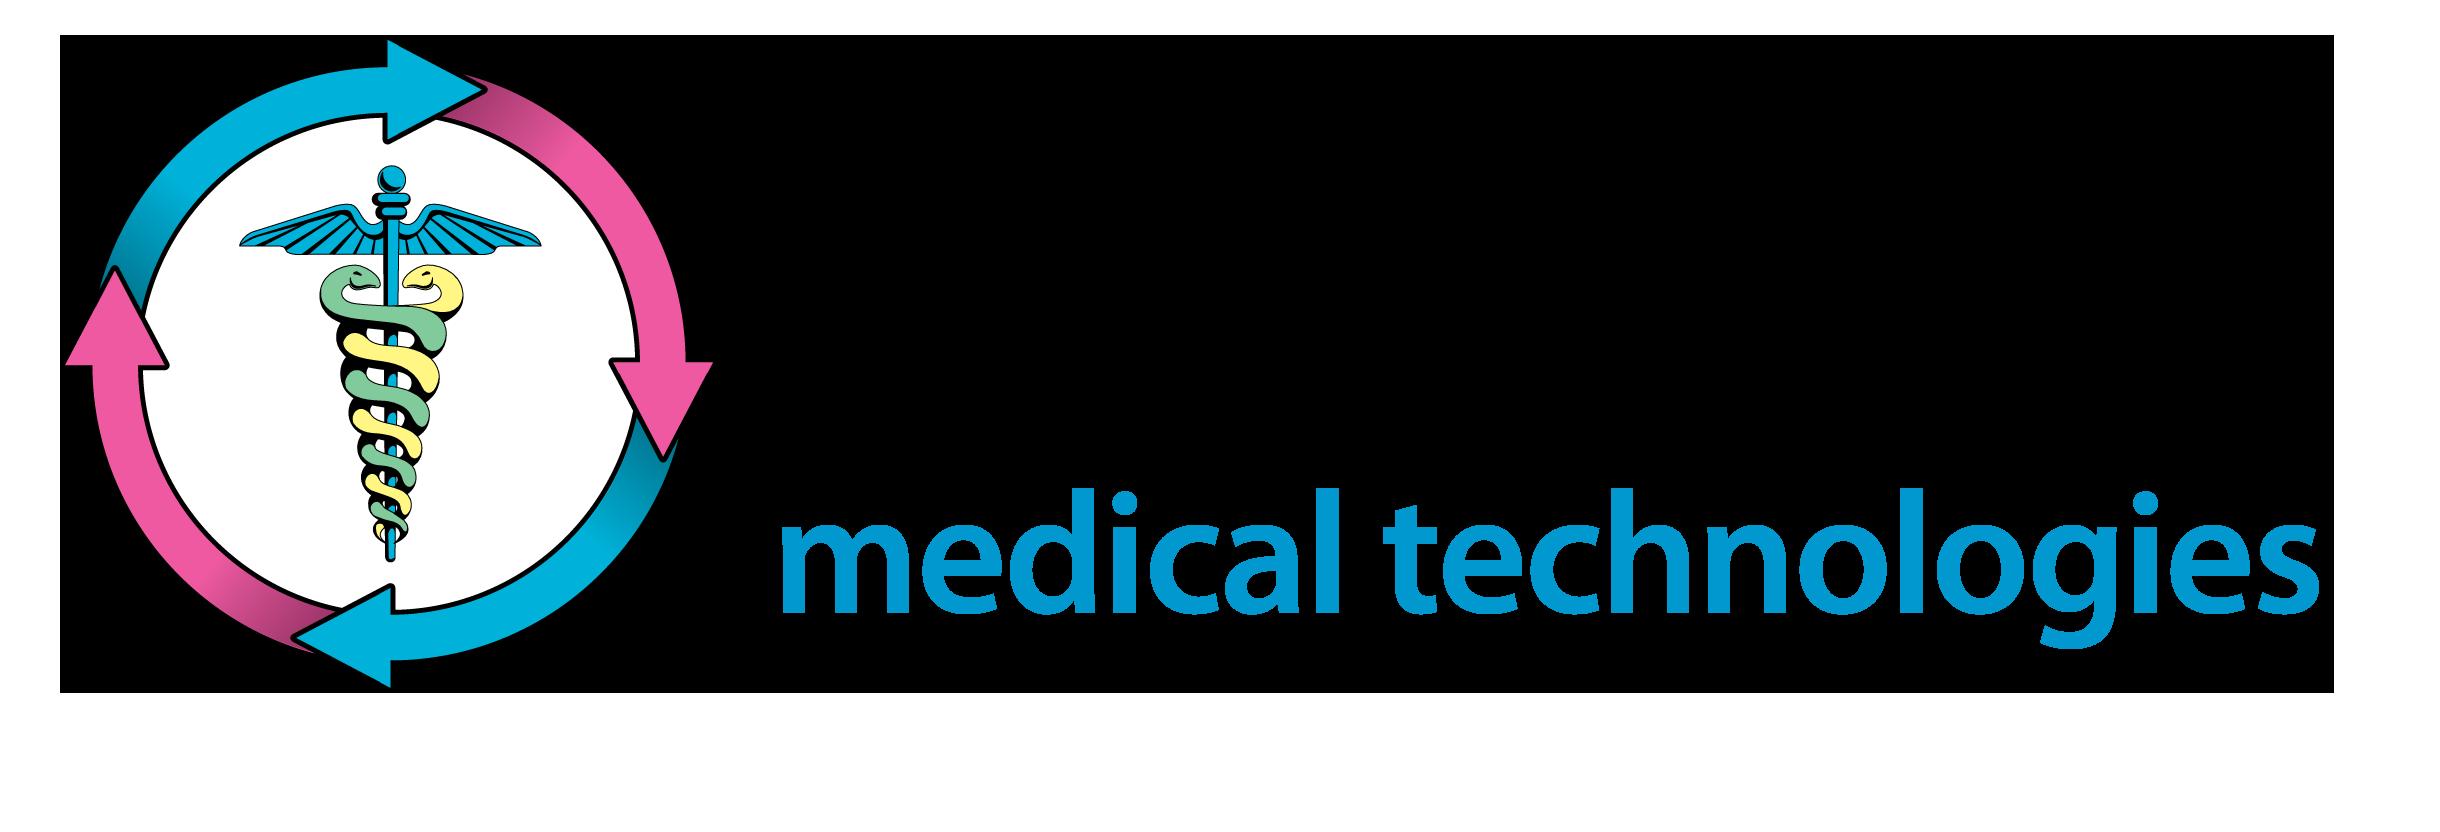 Divergent Medical Technologies